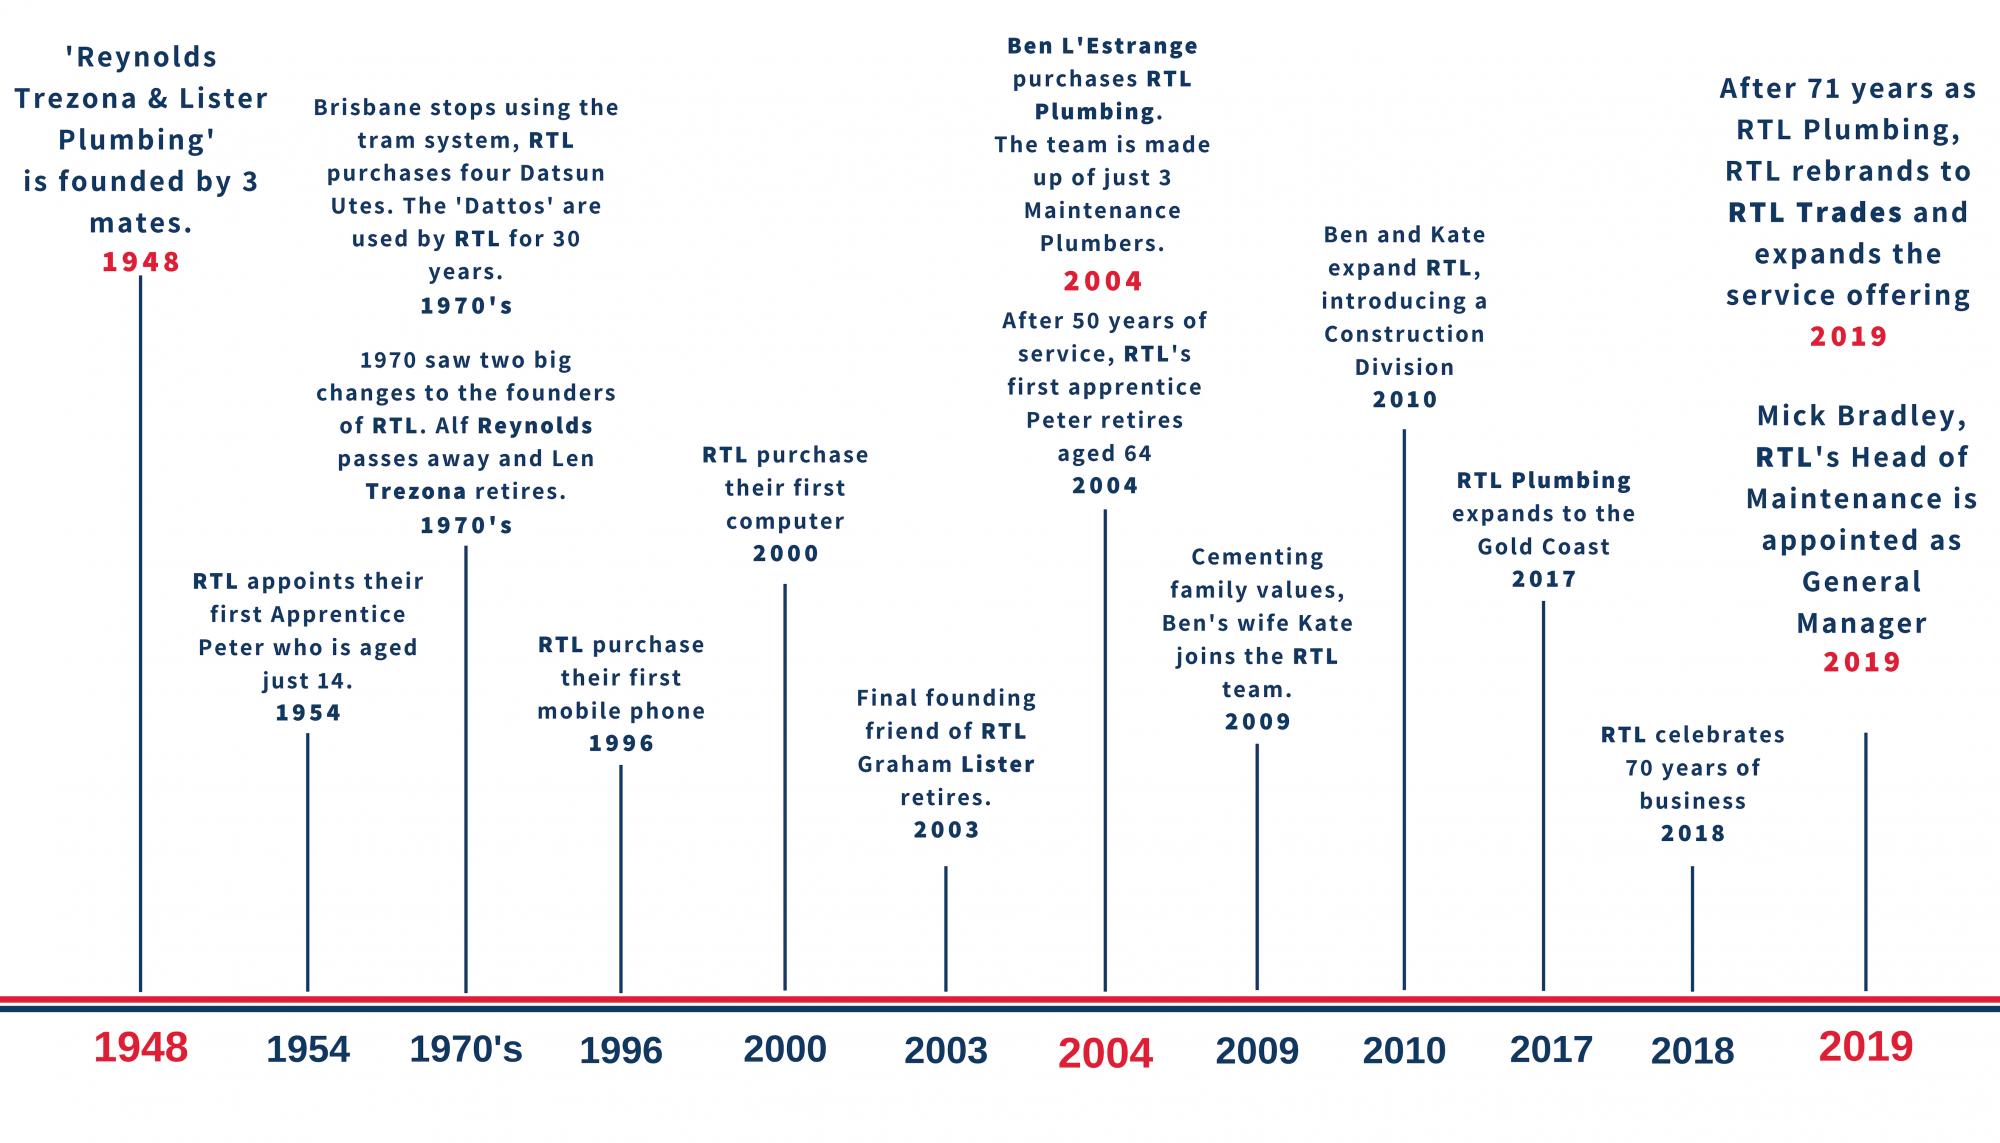 RTL Trades 71 Year Timeline